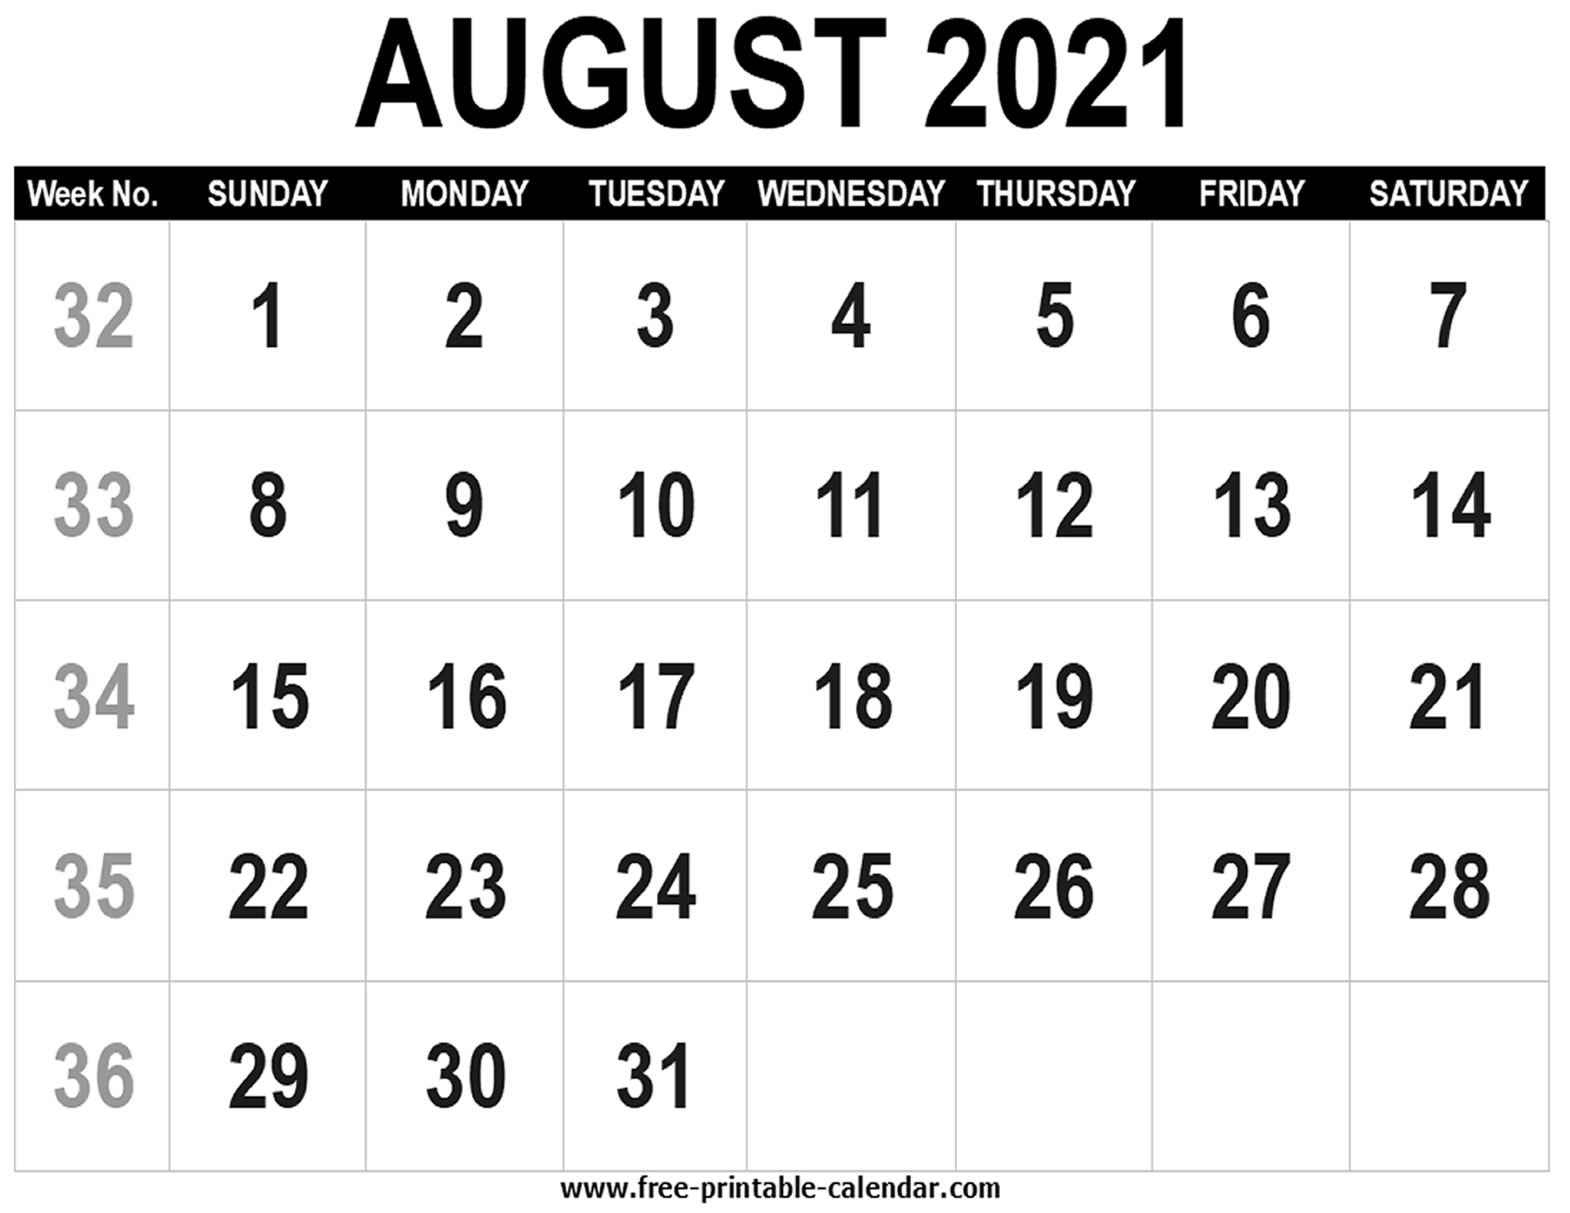 Blank Calendar 2021 August - Free-Printable-Calendar August 2021 Blank Calendar Printable